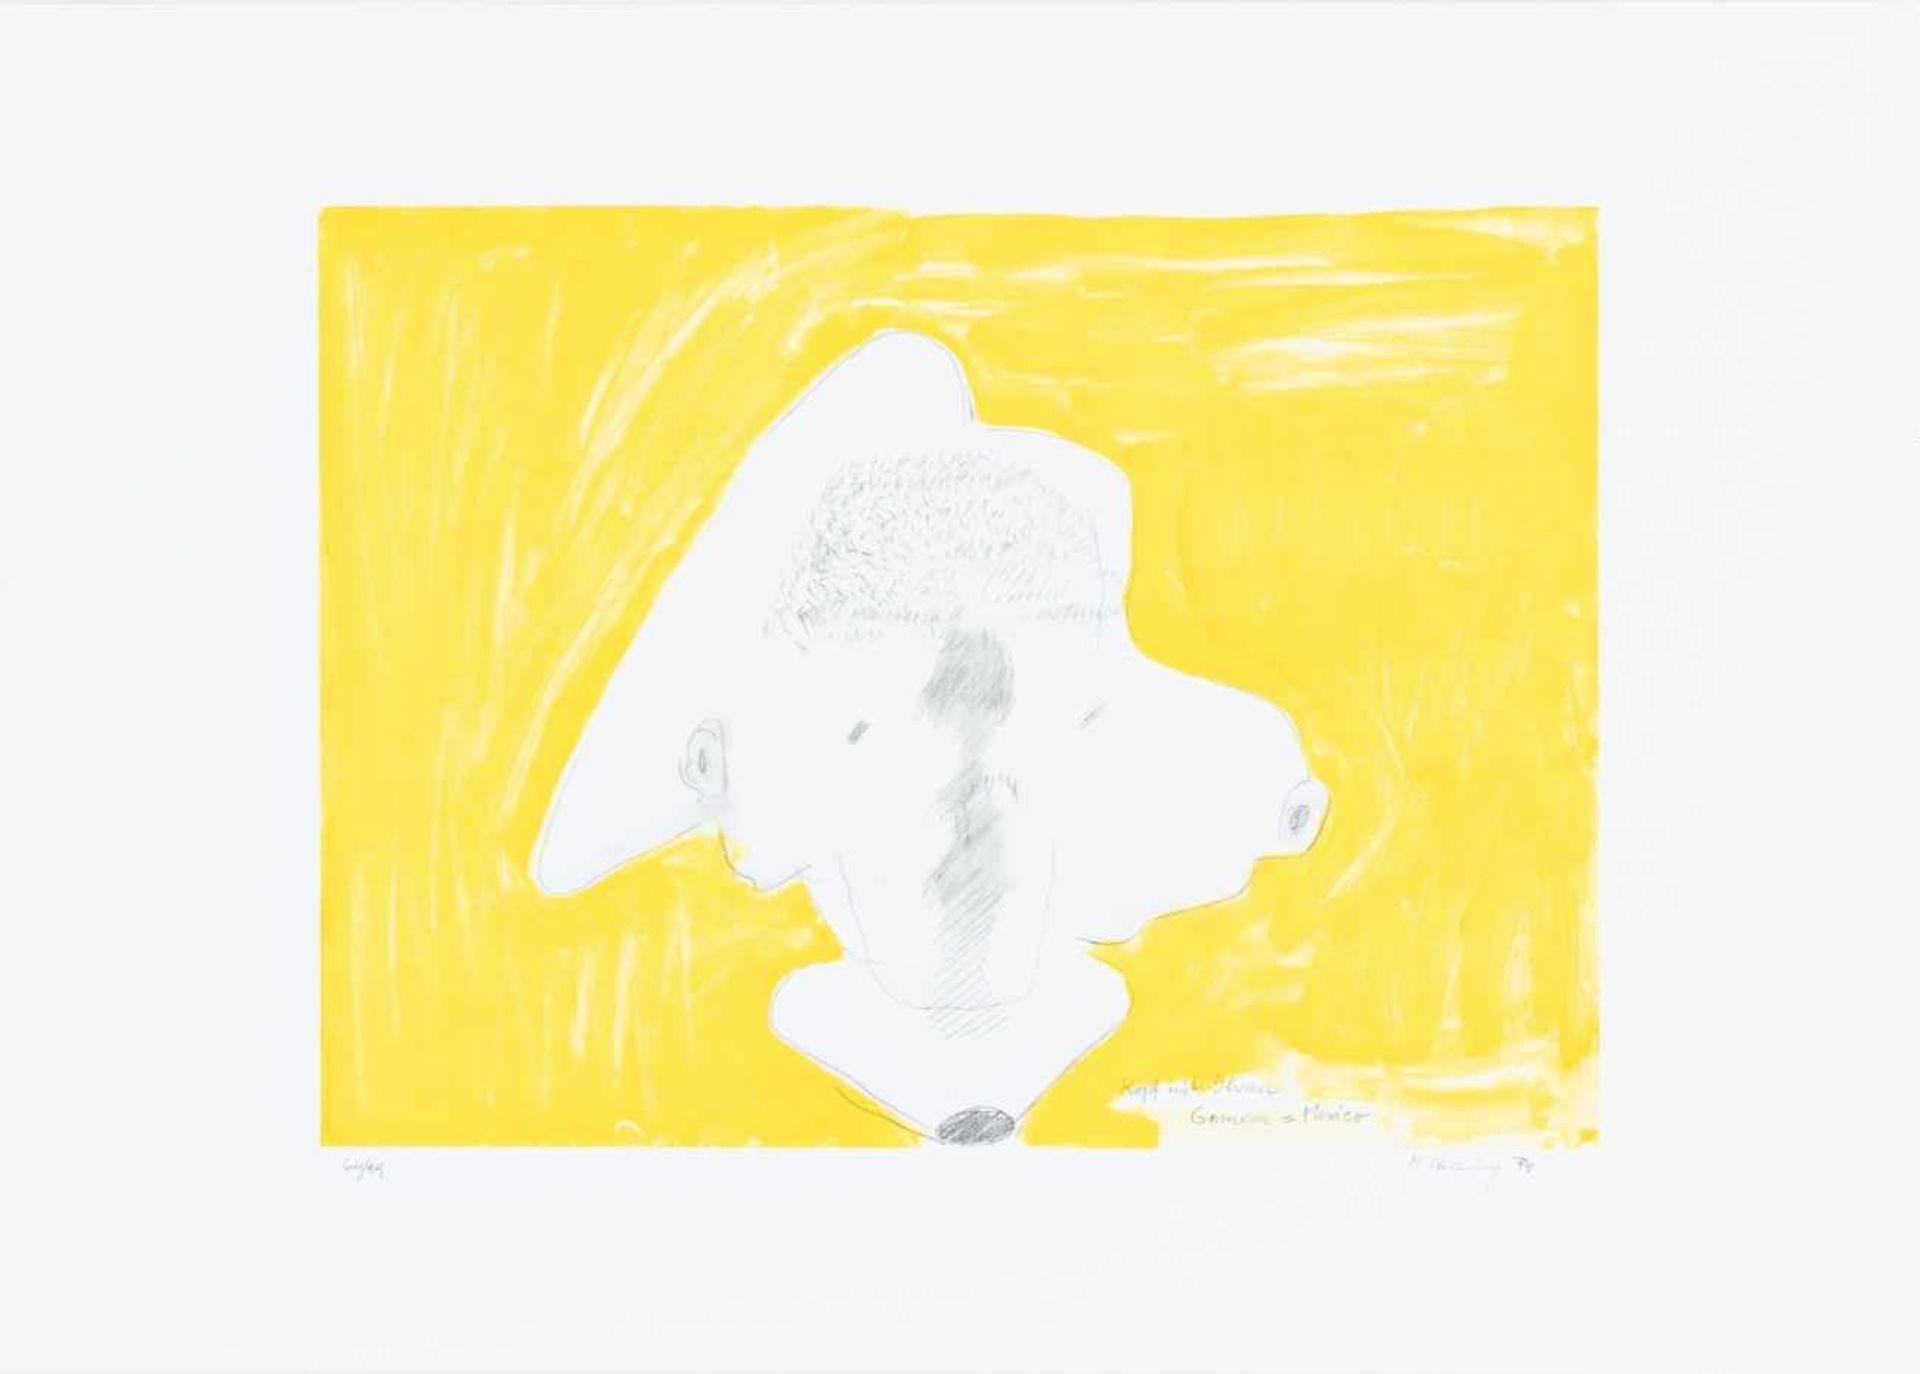 MARIA LASSNIG(1919 KAPPEL AM KRAPPFELD - 2014 WIEN)KOPF MIT OHREN GOMERA = MEXICO, 1999Lithografie